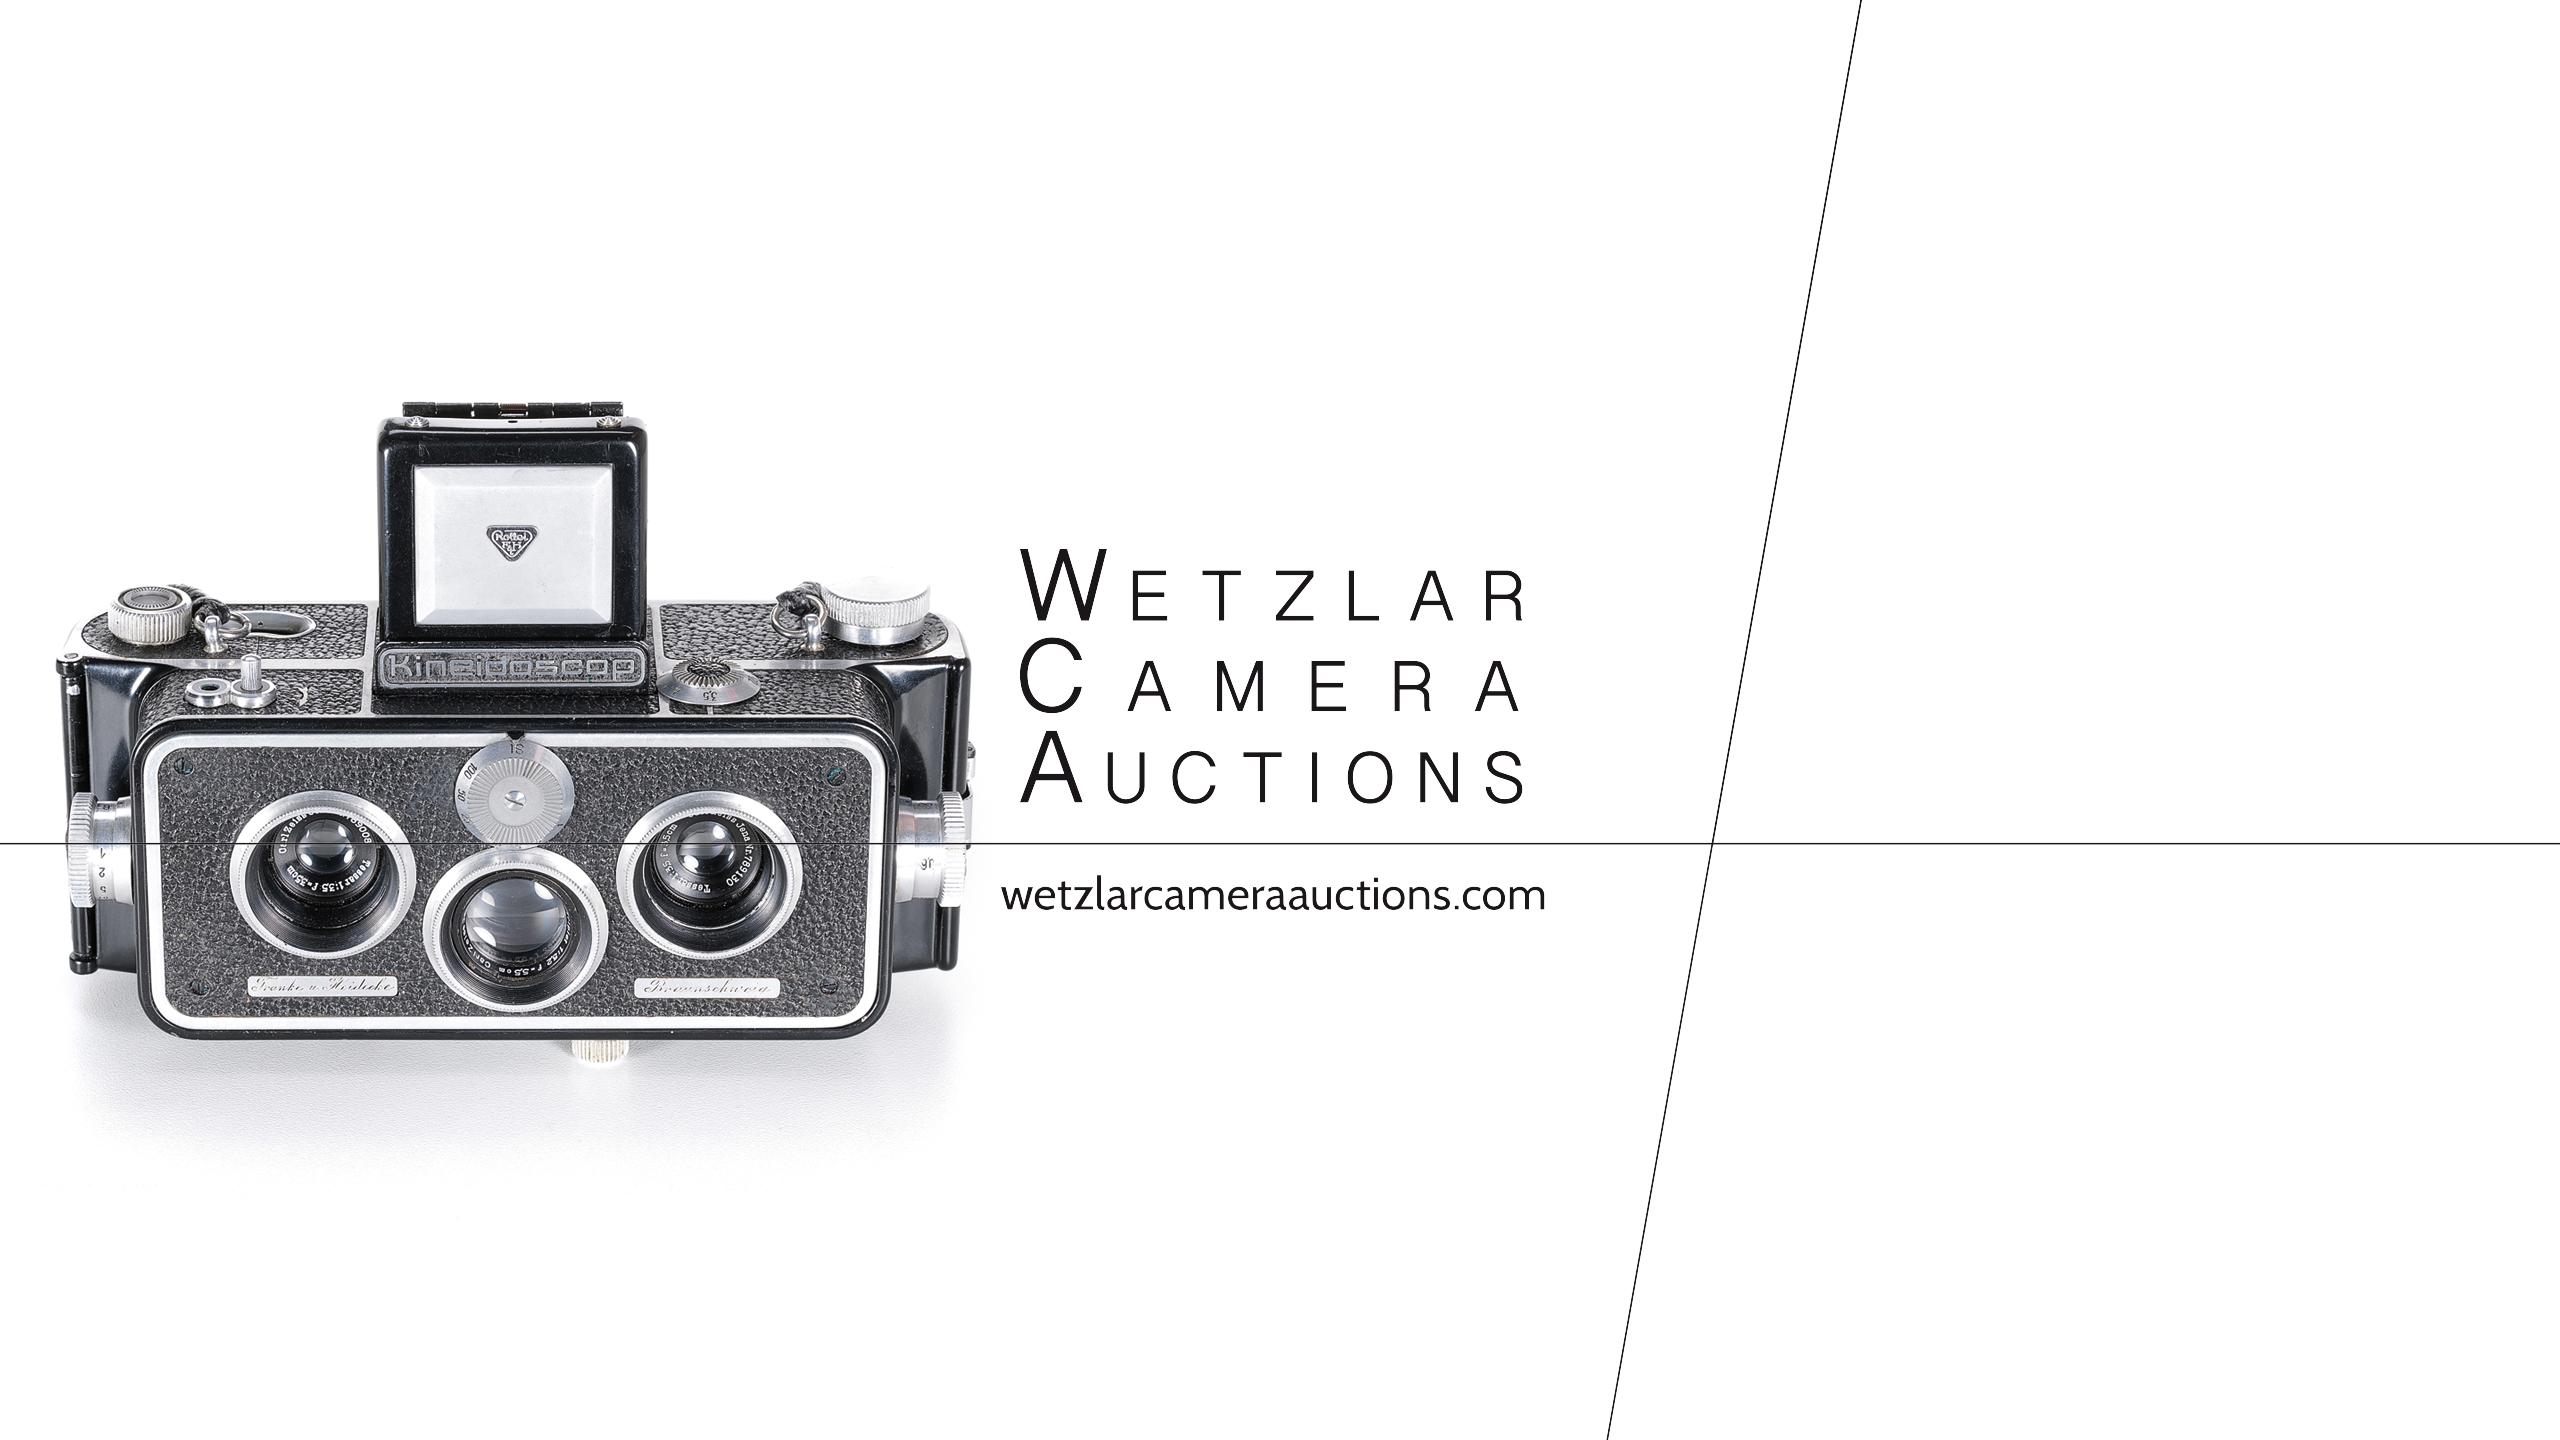 Wetzlar Camera Auctions - Rollei Stereo Kineidoscop 35 mm Prototype - October 09th 2021